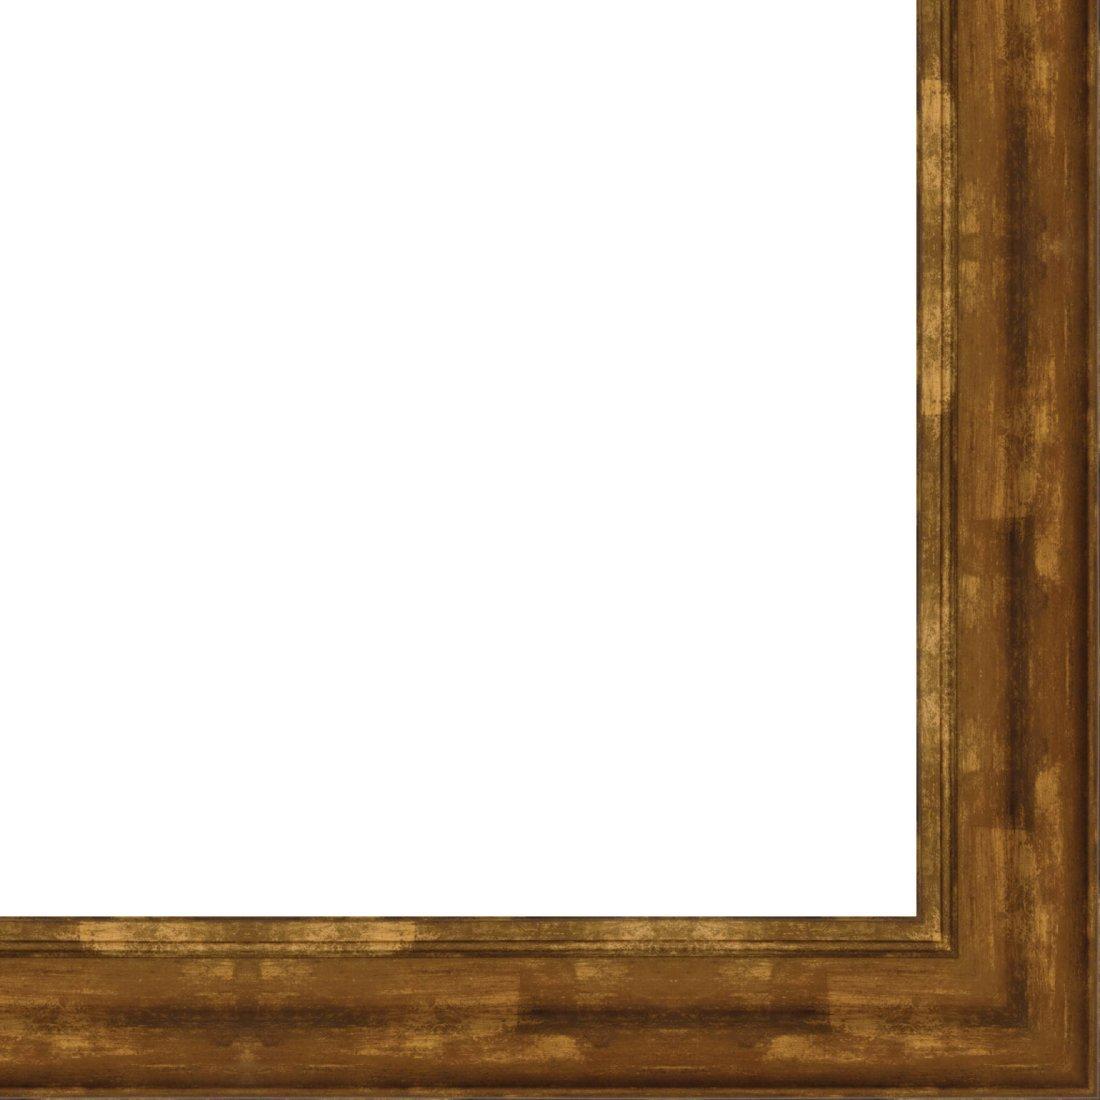 Picture Frame Moulding (Wood) 18ft bundle - Traditional Antique Gold Finish - 4.375'' width - 3/4'' rabbet depth